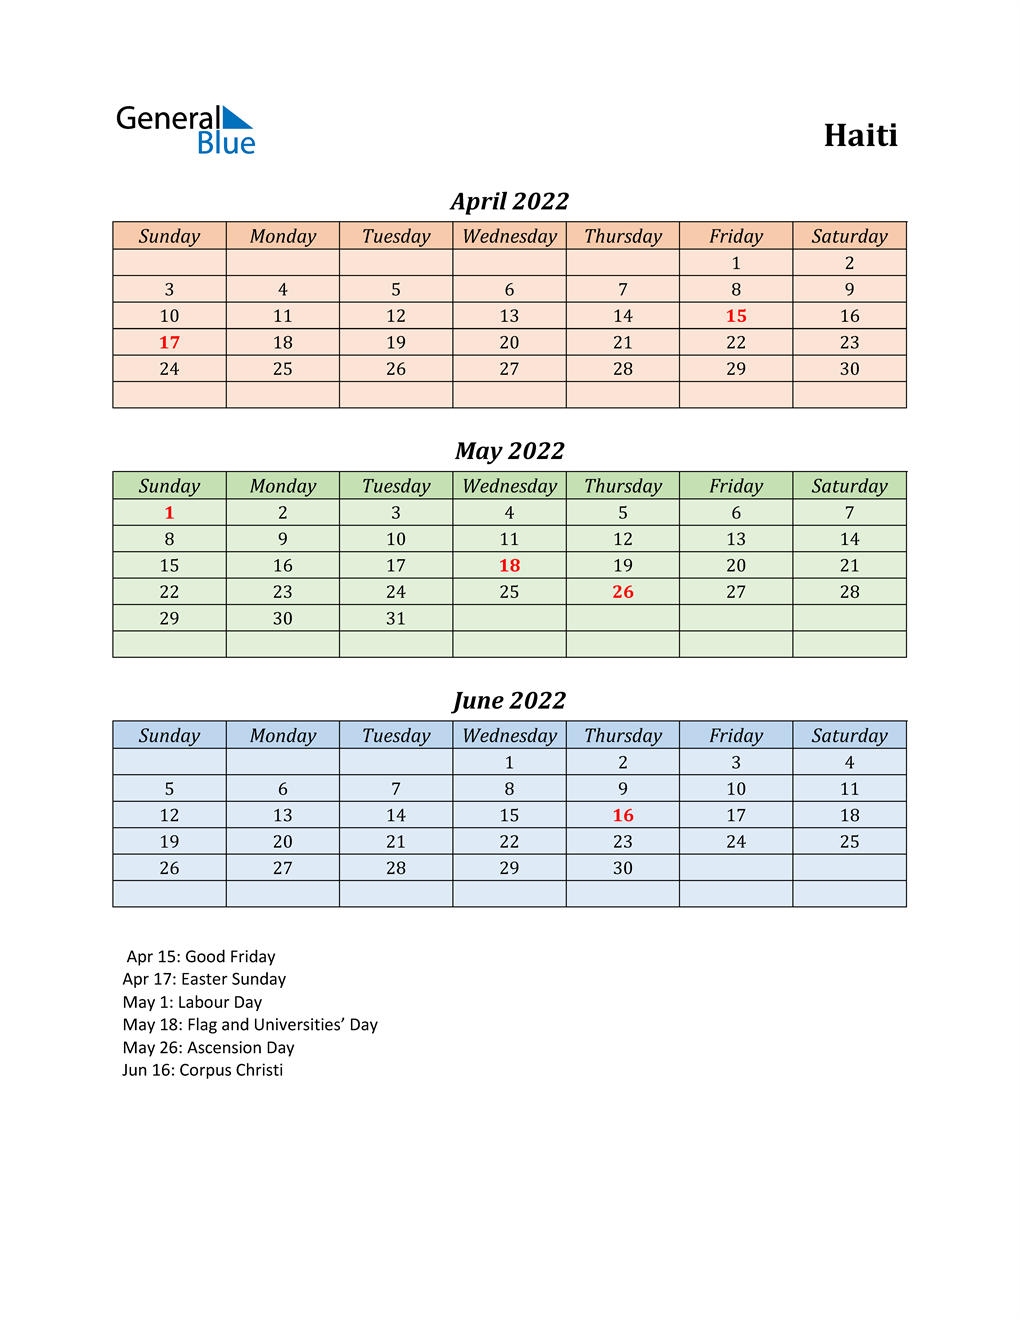 Q2 2022 Holiday Calendar - Haiti